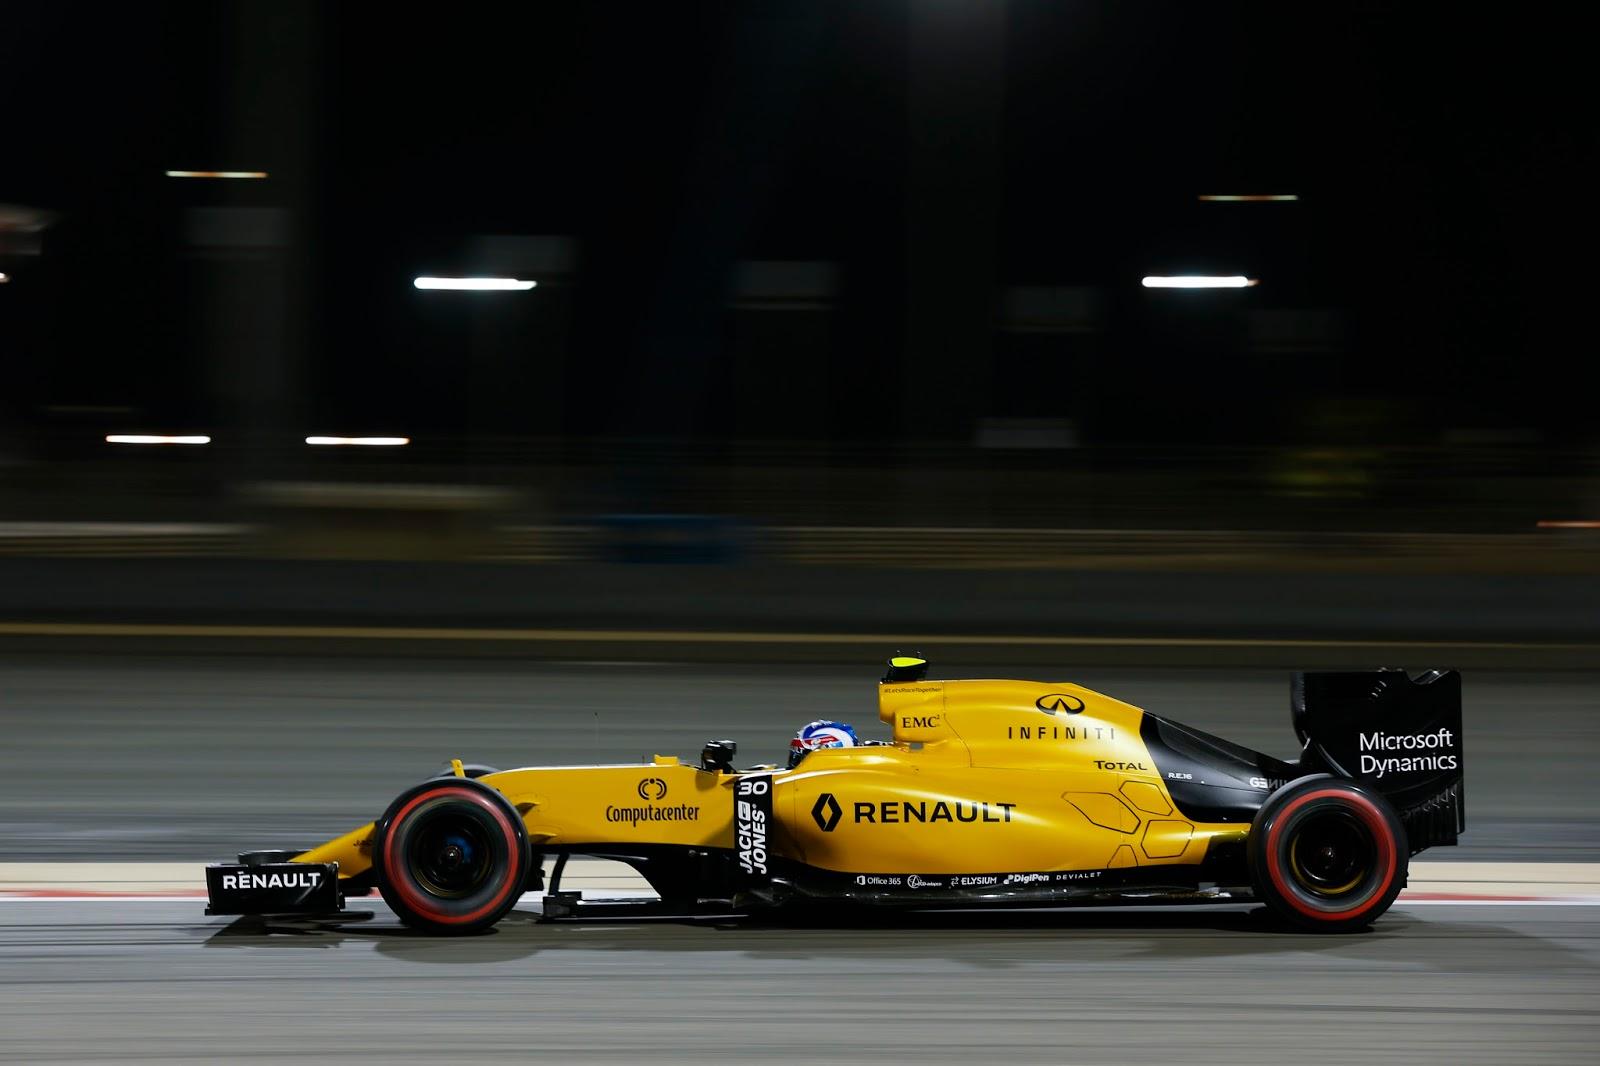 Renault Sport Formula One Wallpaper Renault Rs16 F1 852707 Hd Wallpaper Backgrounds Download